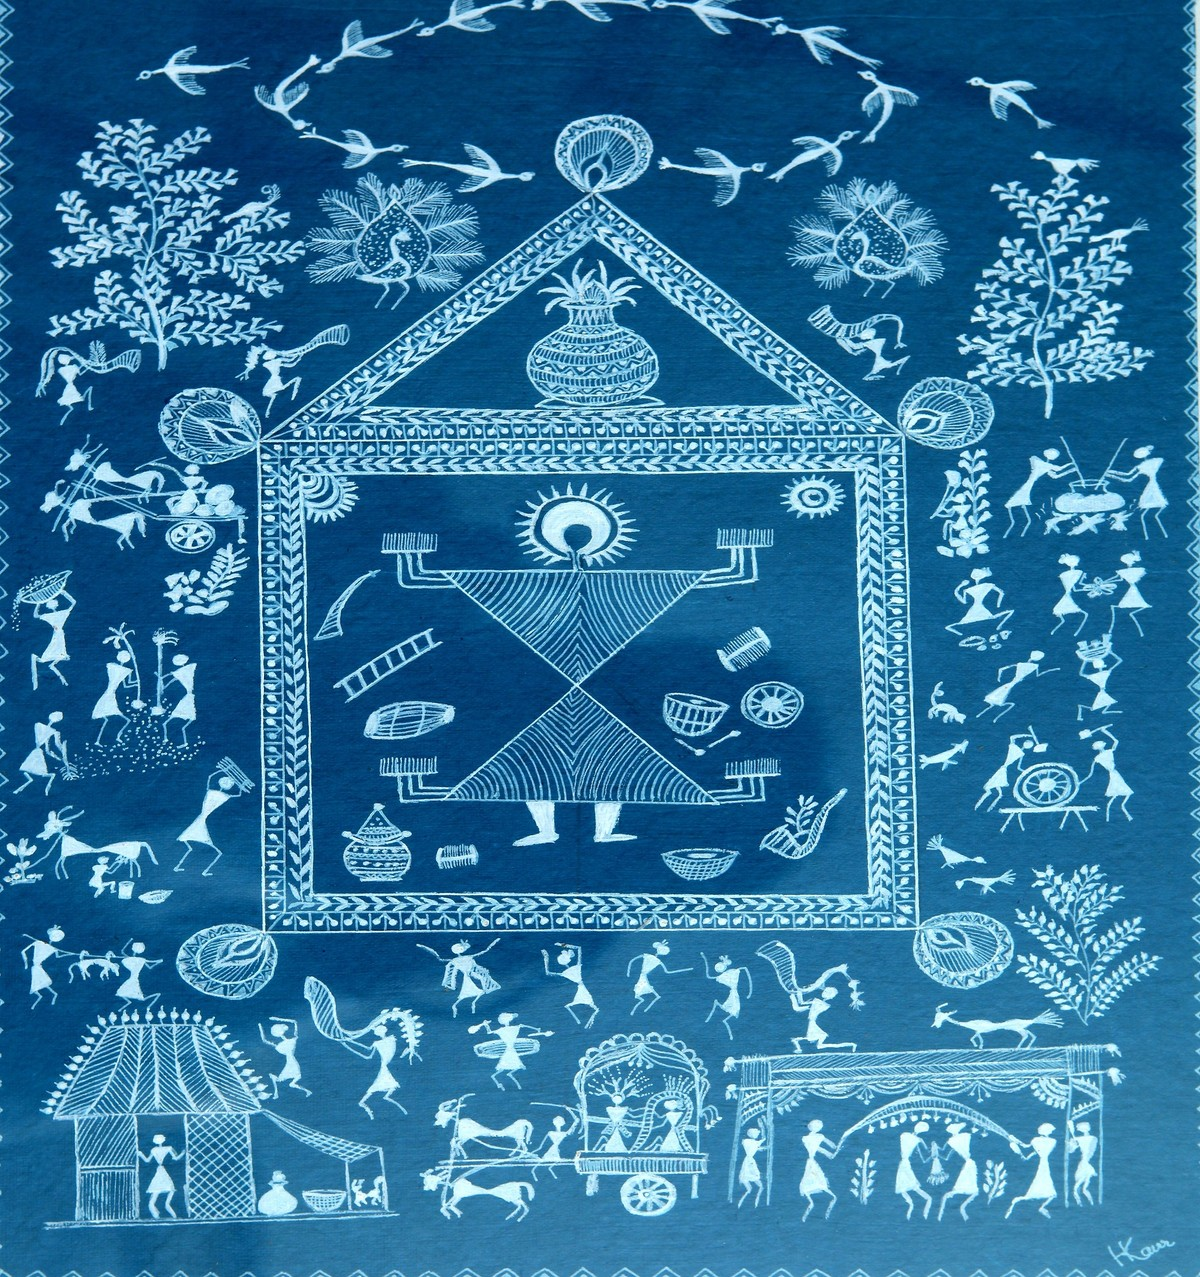 ANCIENT WARLI ARTS ON HANDMADE PAPER by HARPREET KAUR PUNN, Folk Painting, Acrylic on Paper, Blue color